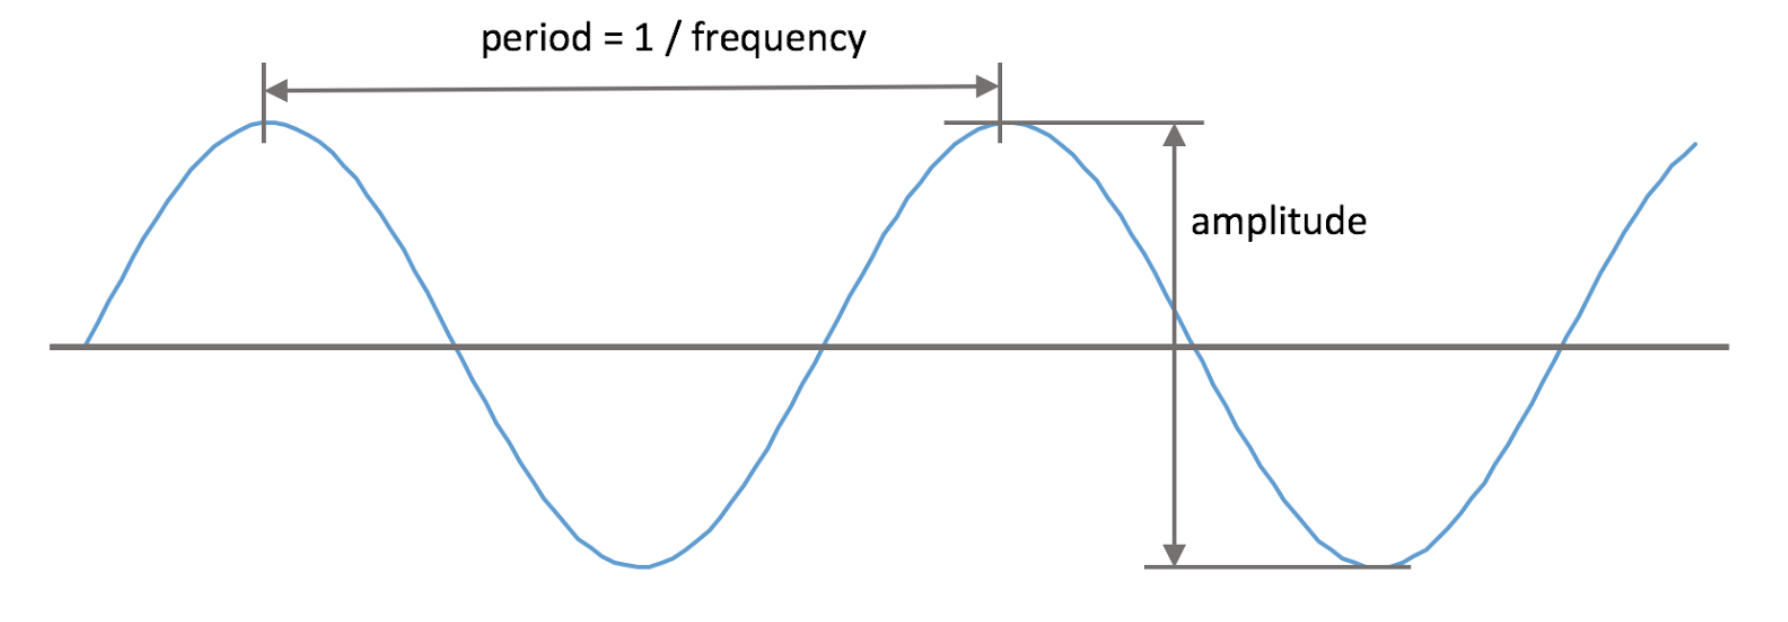 AudioKit и синтезирование звука в iOS-OSX - 3